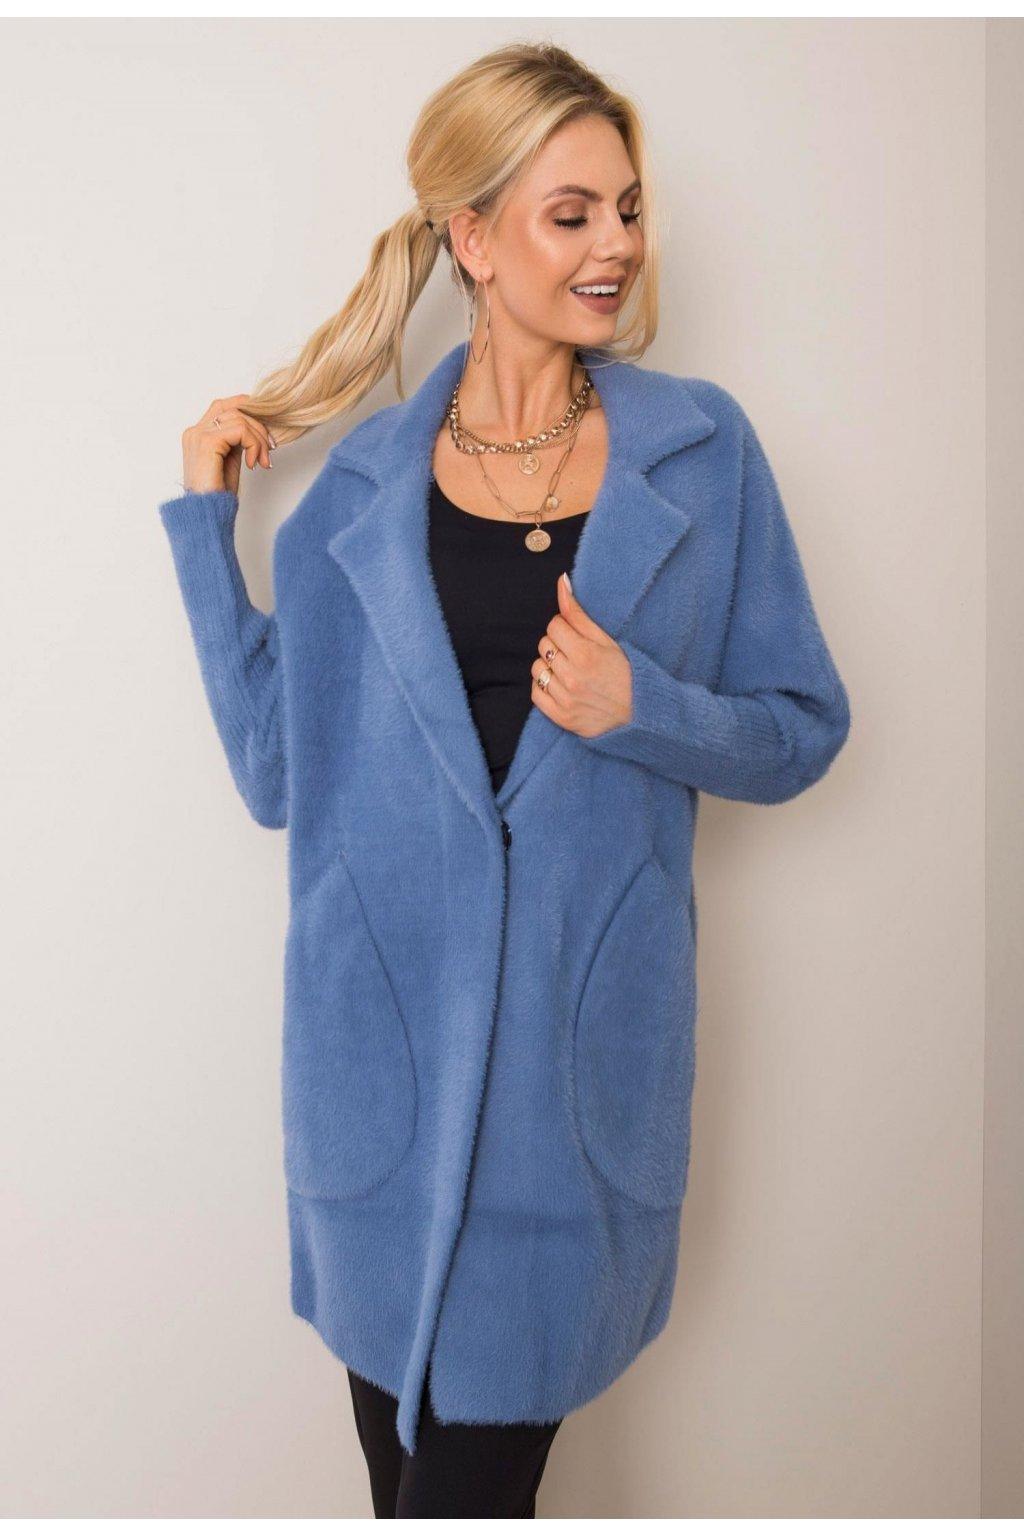 Šedo - modrý dámský kabát